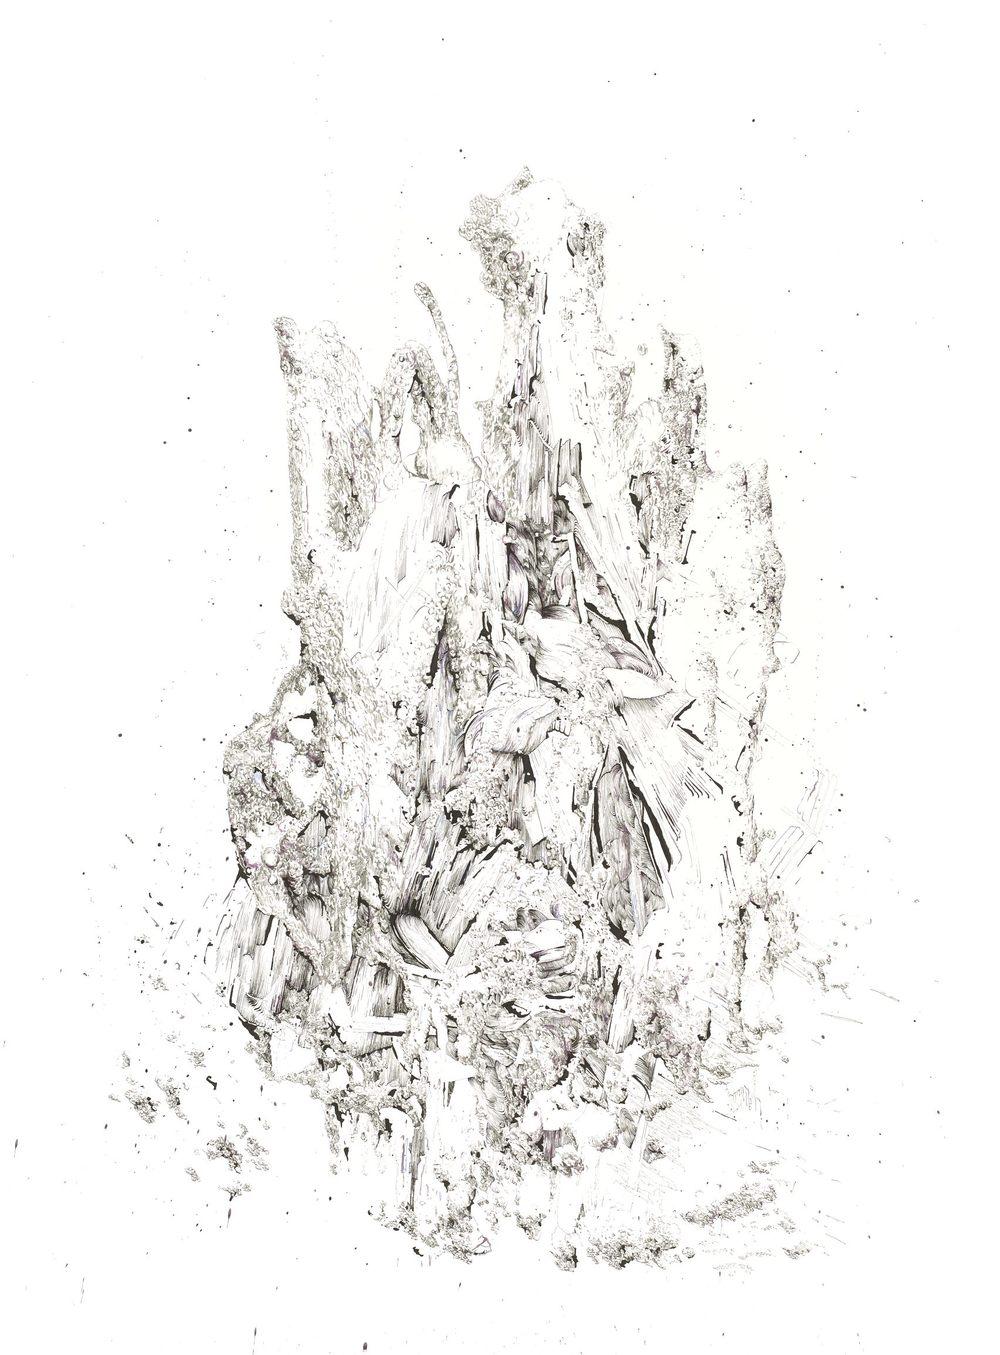 BK P133   untitled   ink & graphit on paper   200x150cm   2013